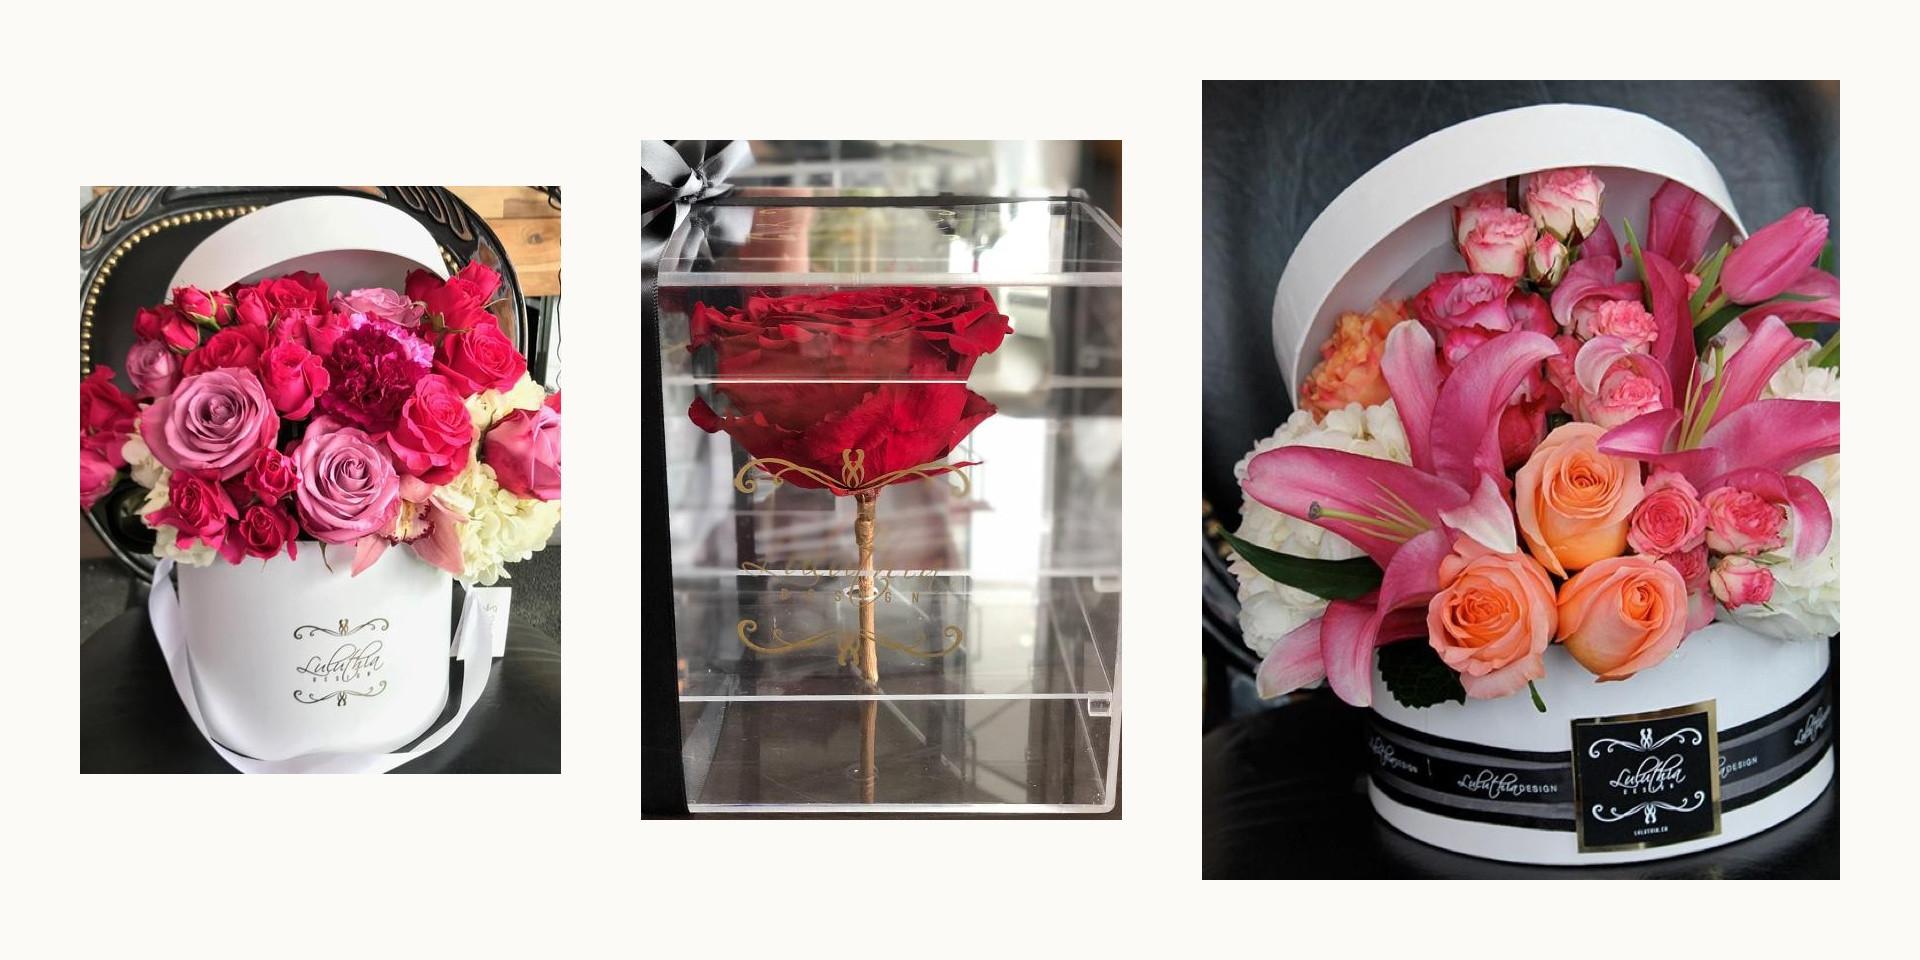 Valentine's Day roses Luluthia Design - Rockland